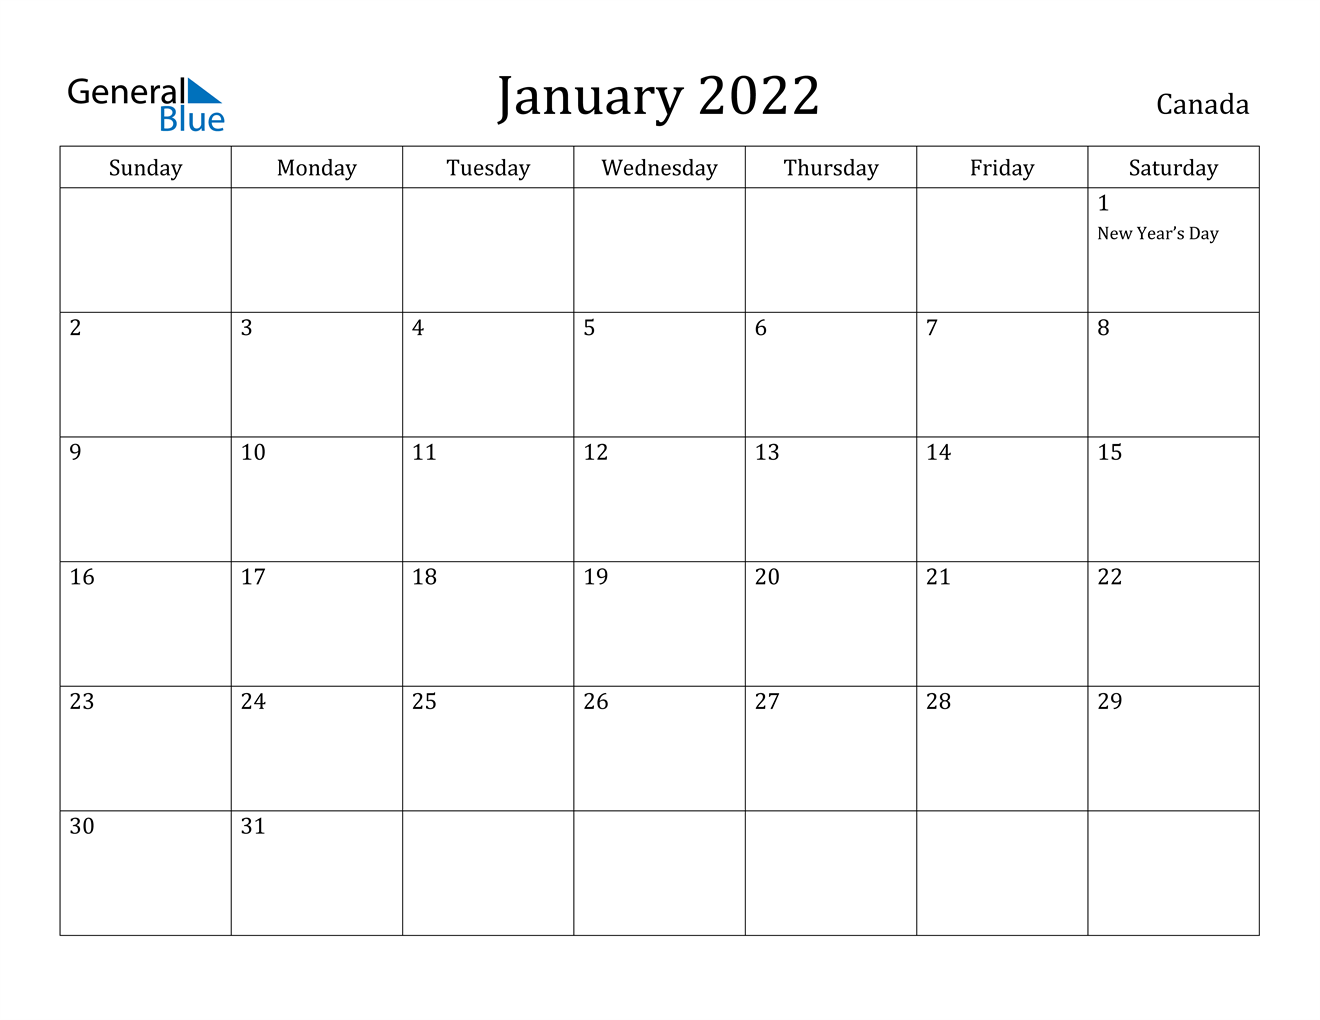 January 2022 Calendar - Canada